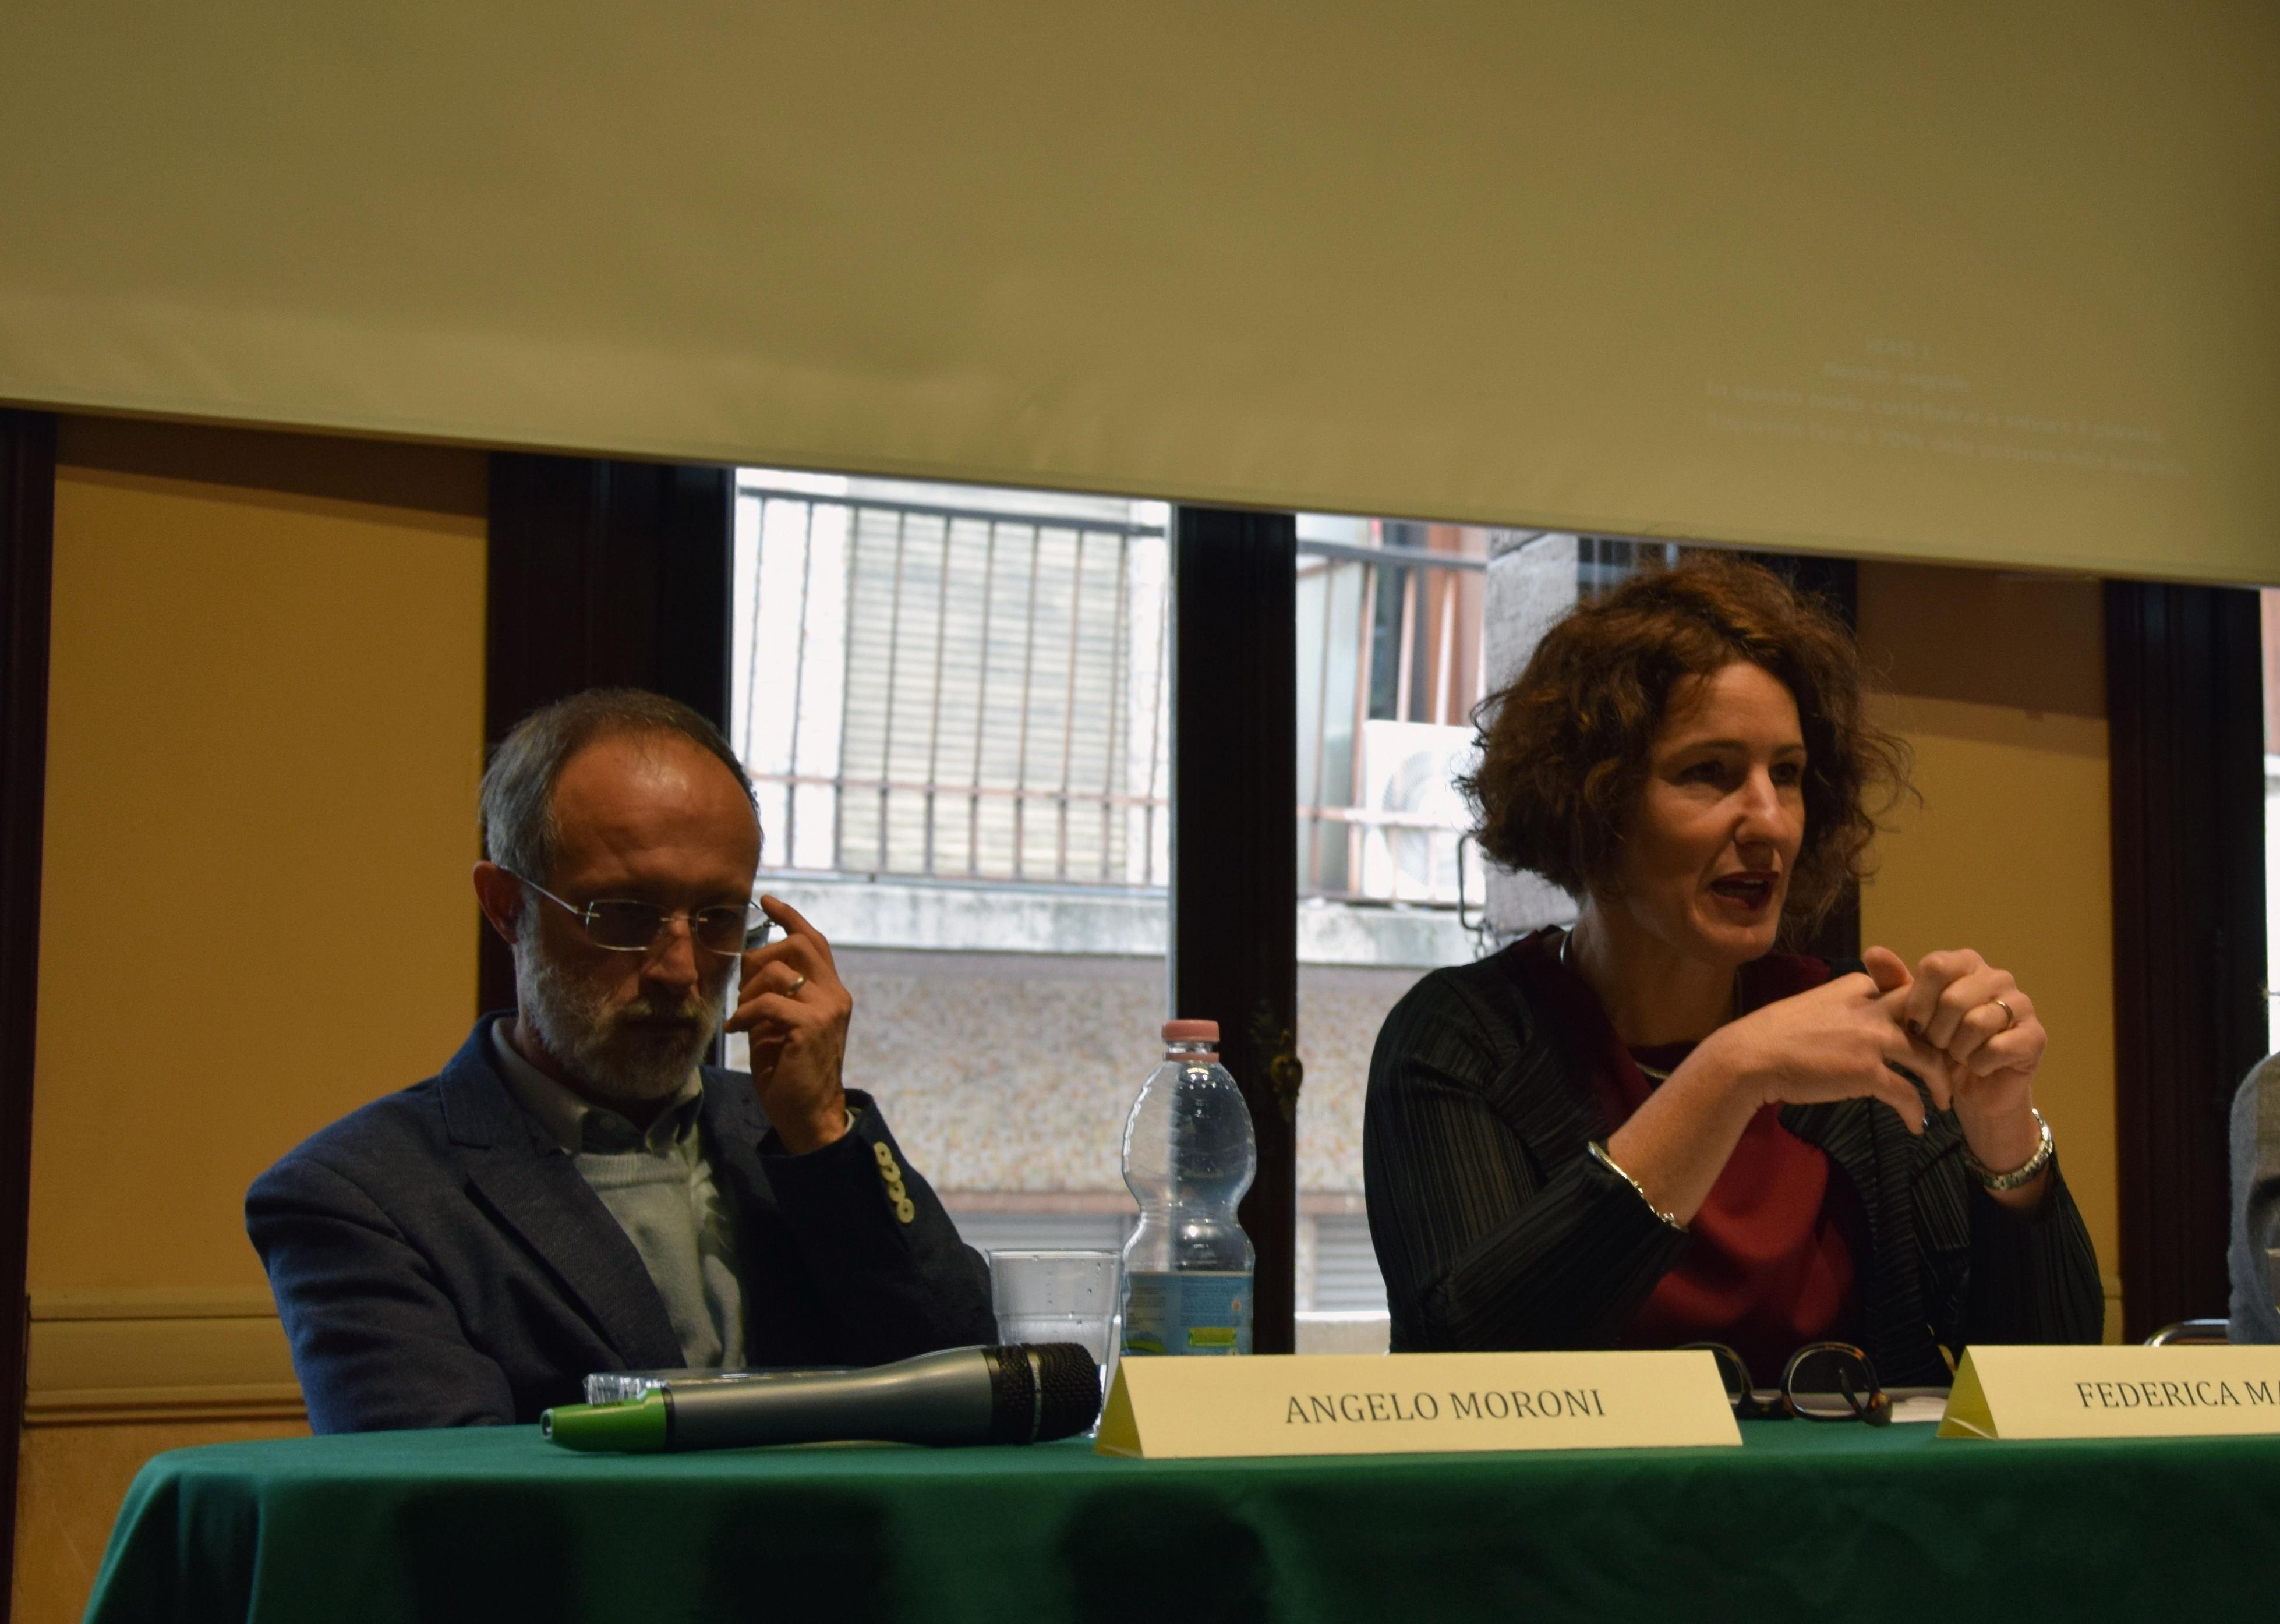 Angelo Moroni e Federica Marabini